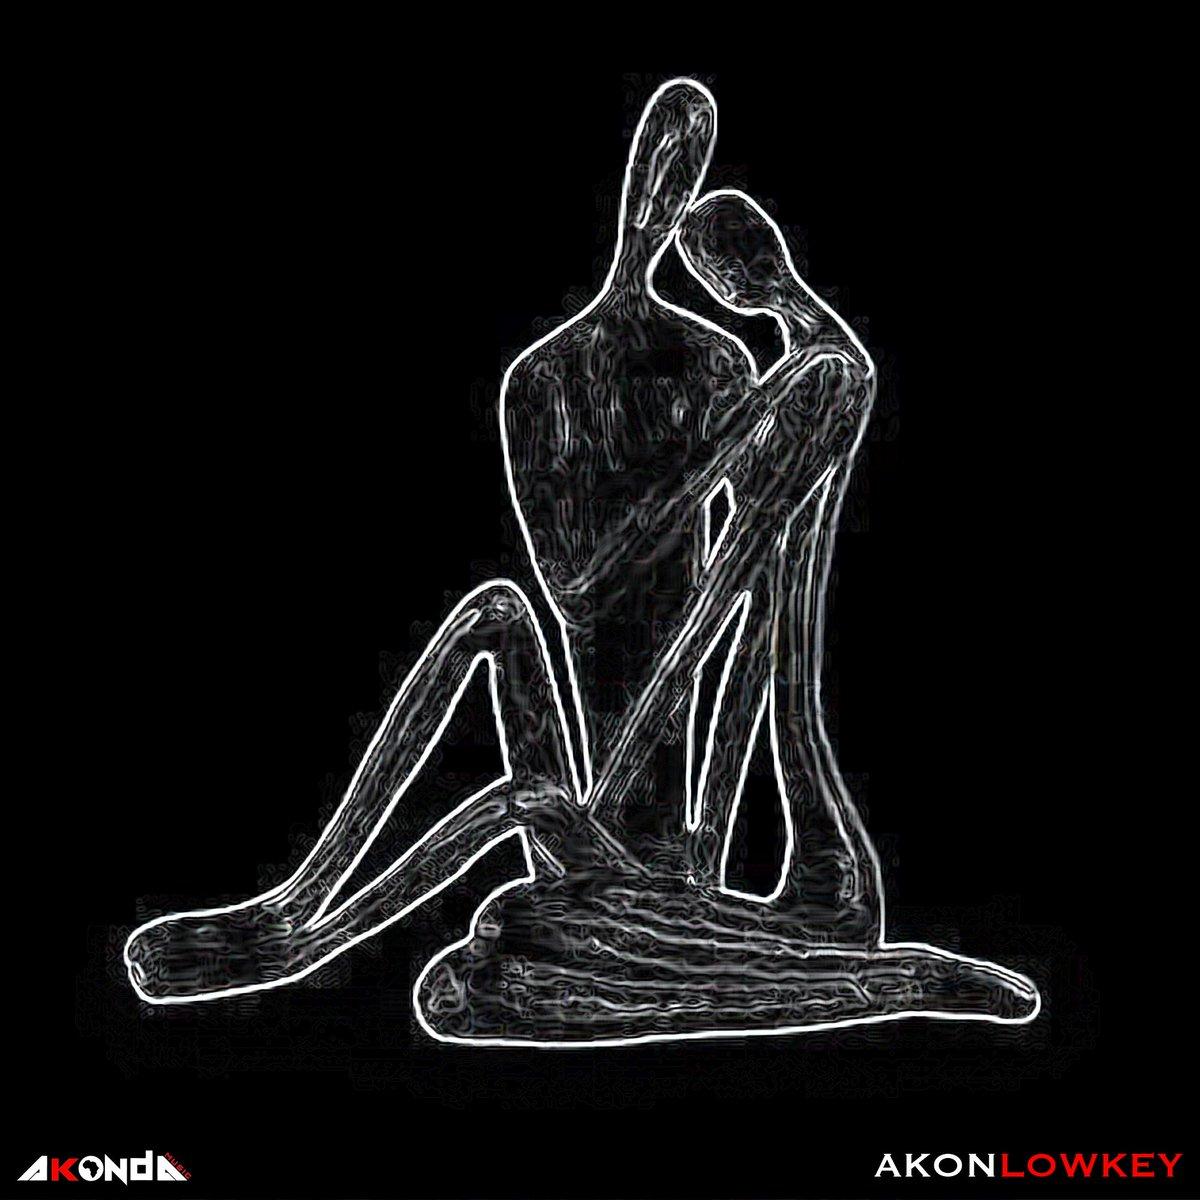 Low Key out now #akon #applemusic #spotify #pandora  download here???????? https://t.co/YaWty6Zx8I https://t.co/L2OsGnj37F